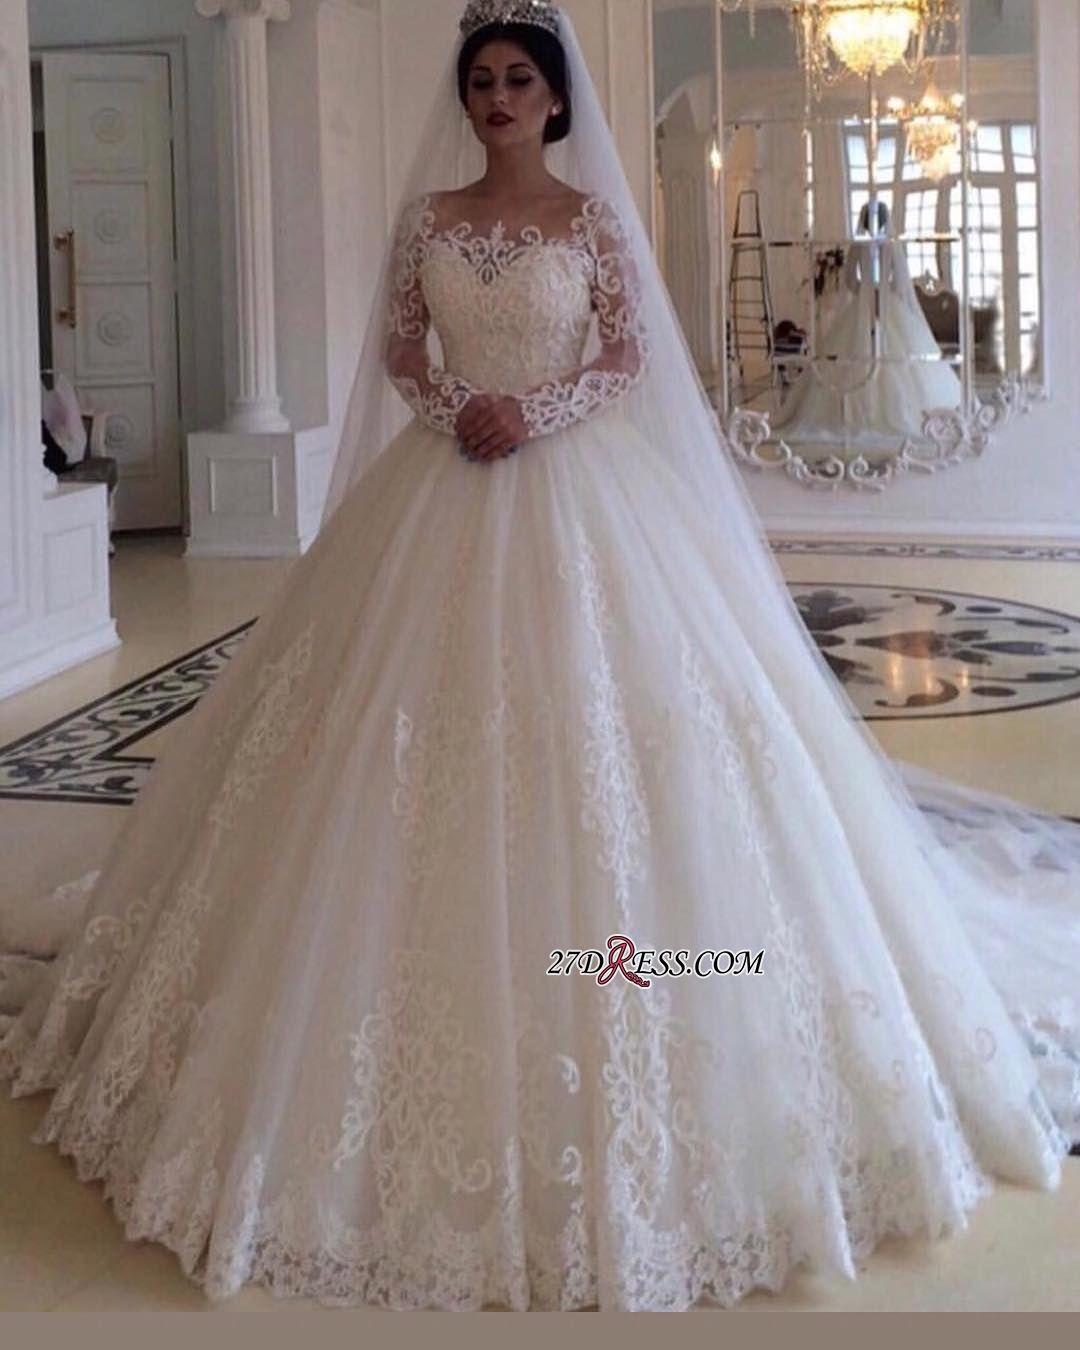 Glamorous Bateau Long Sleeves Wedding Dress Lace Princess Bridal Gowns Onlin Long Sleeve Wedding Dress Lace Wedding Dress Long Sleeve Ball Gown Wedding Dress [ jpg ]